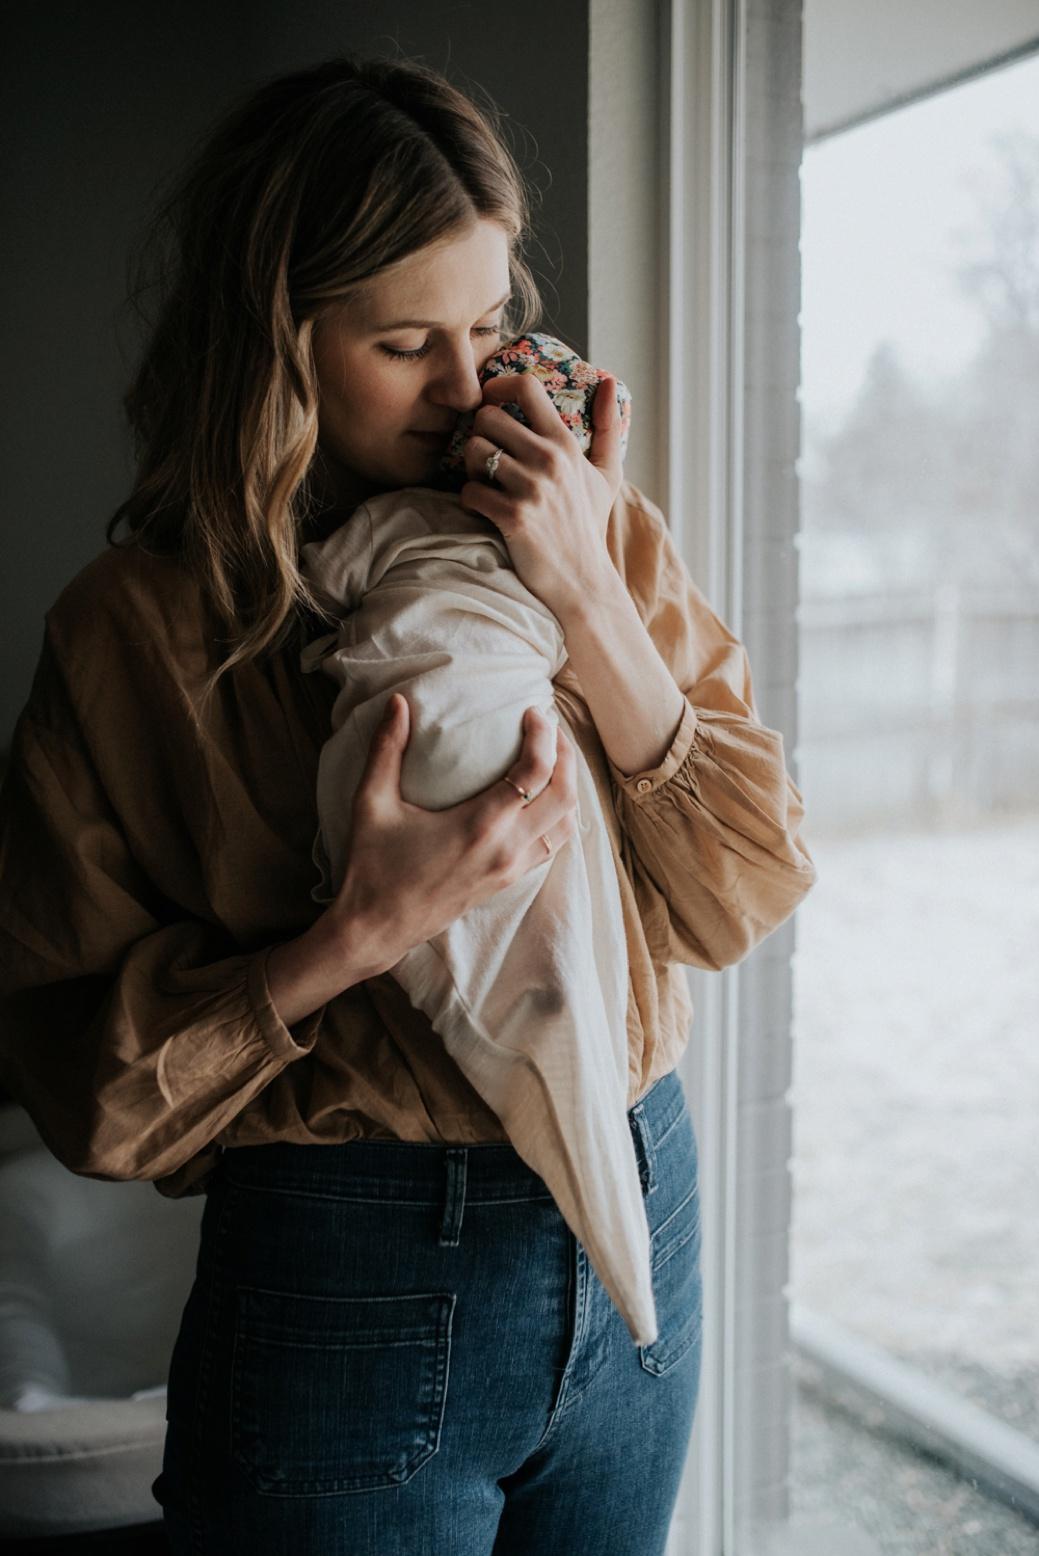 Denver-newborn-photography-in-home